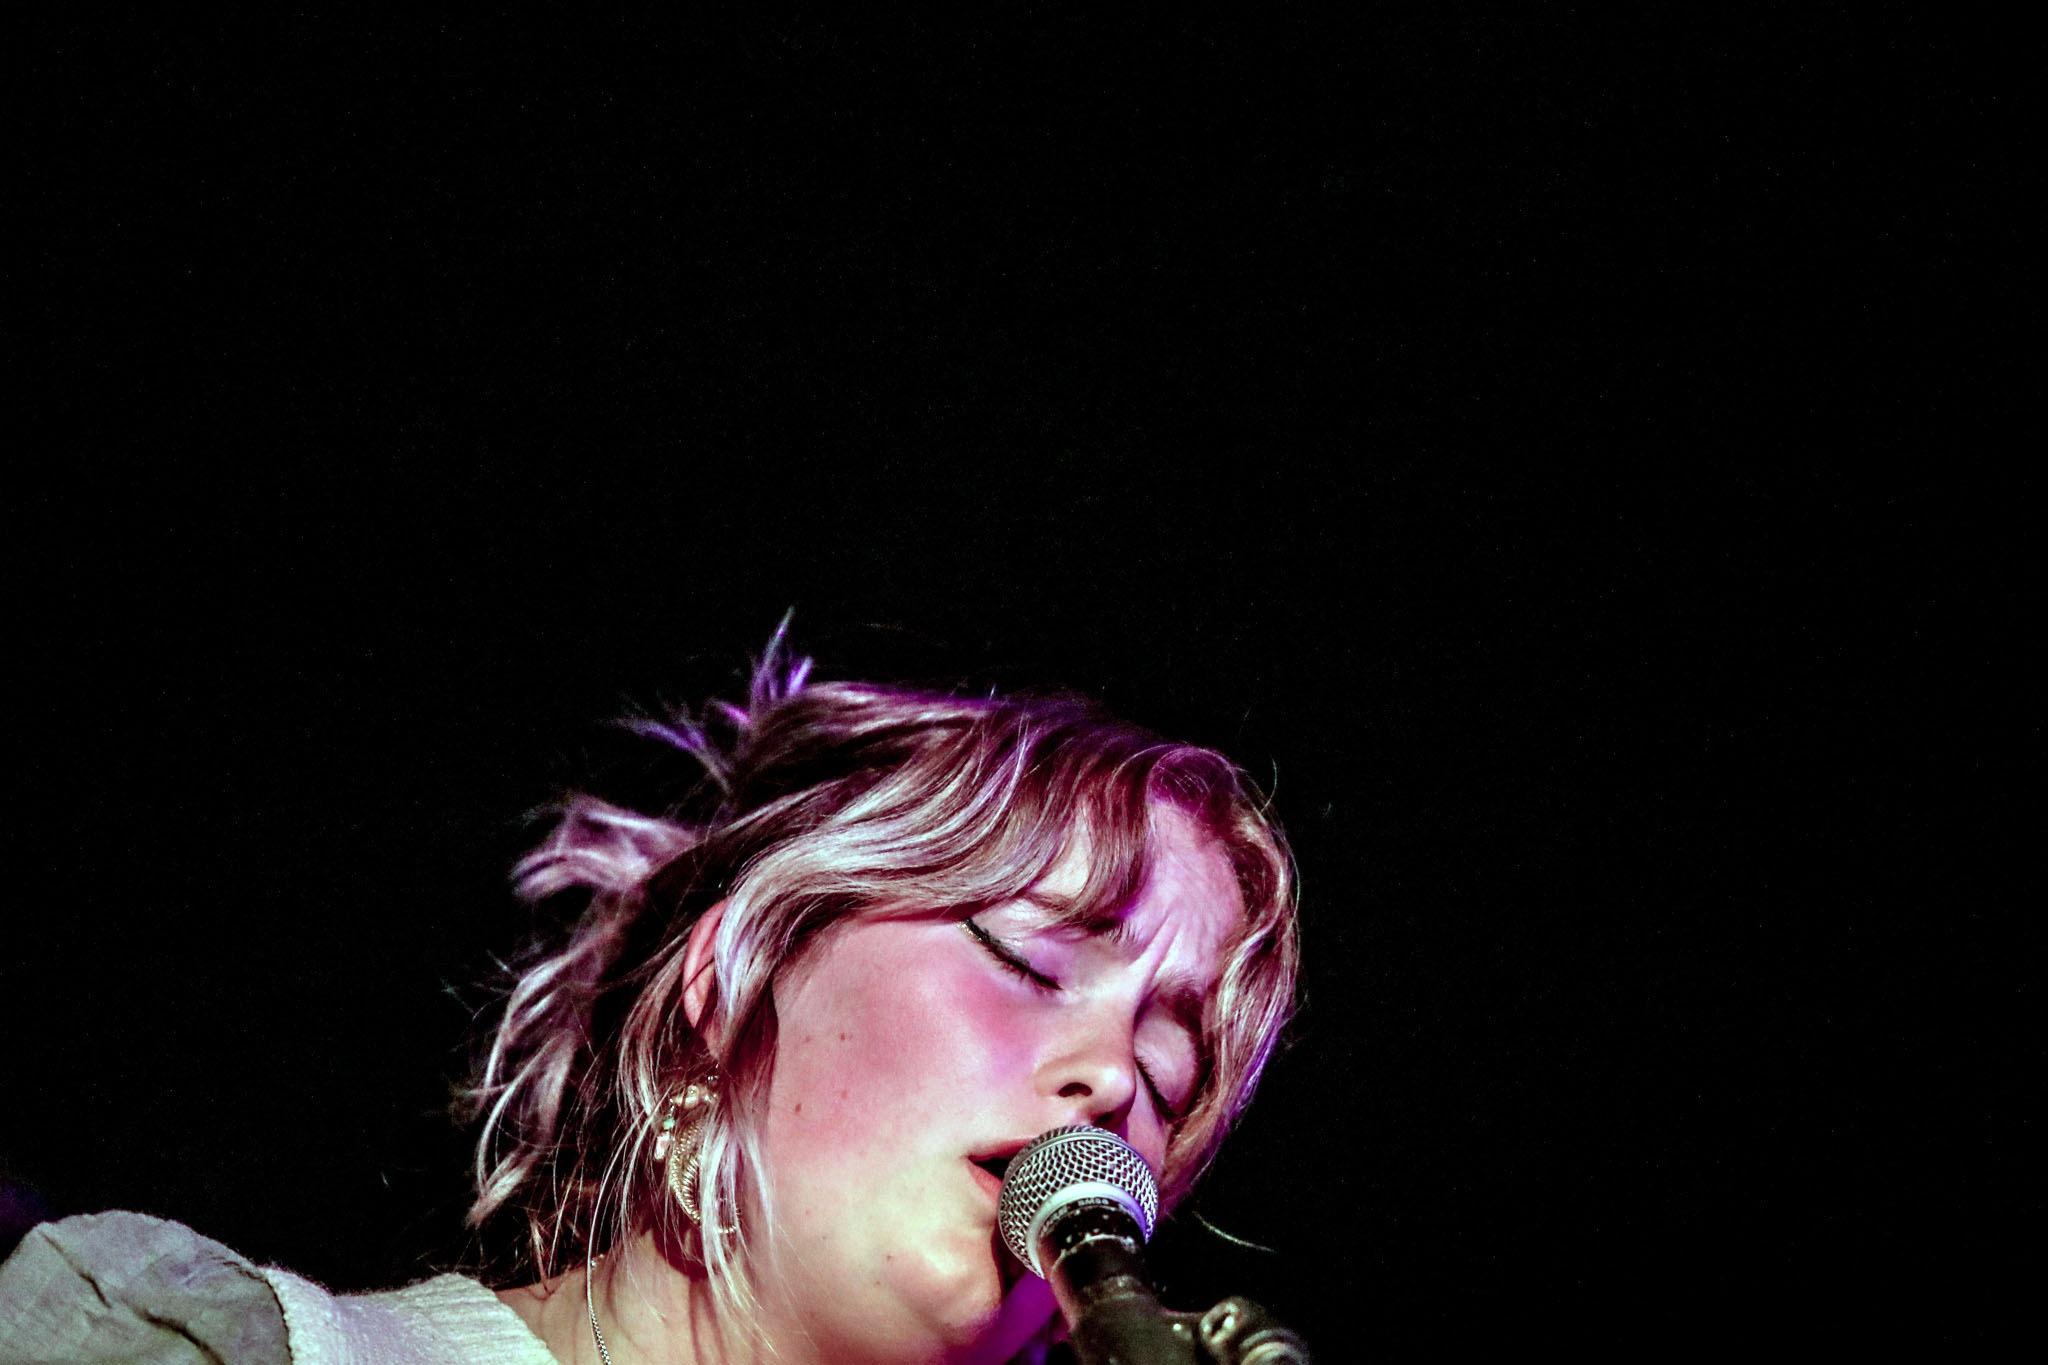 Katy J Pearson / elkyn – The Crescent, York, 05/06/2021